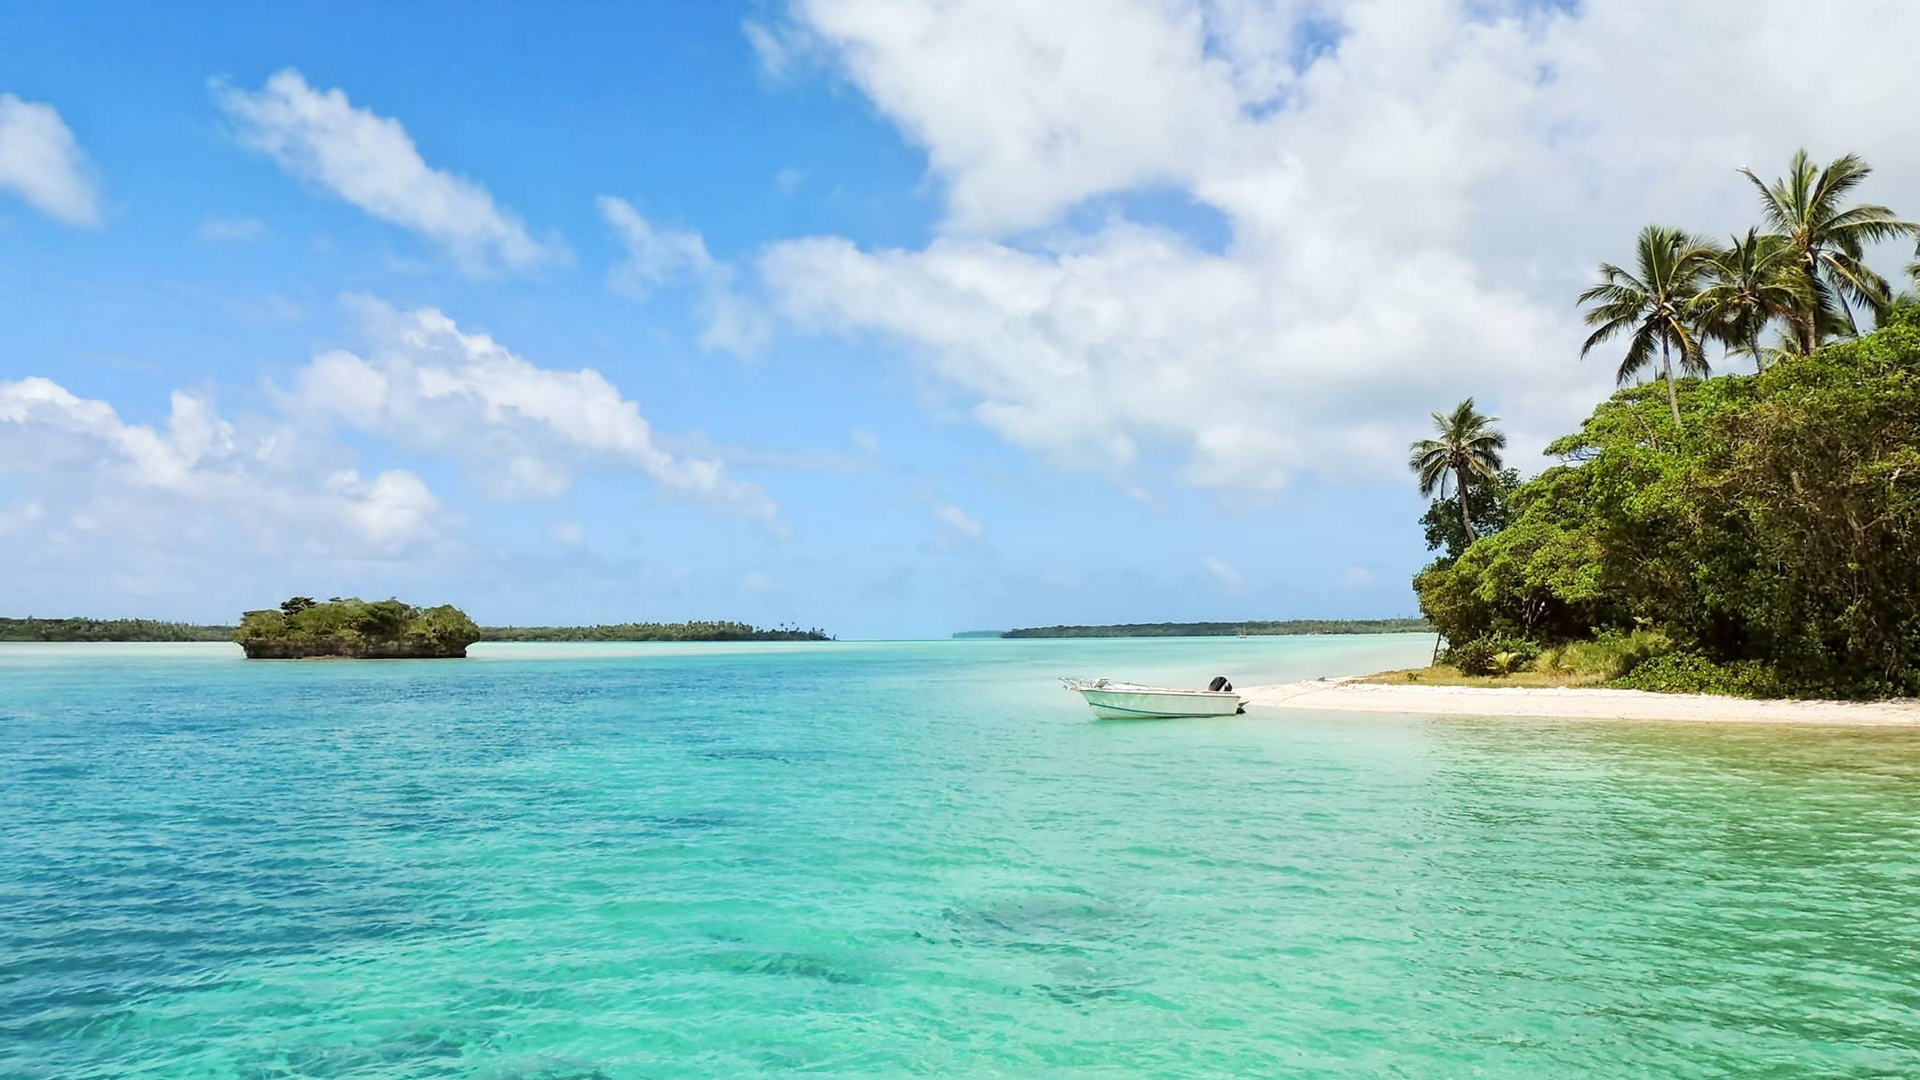 A view in Comoros